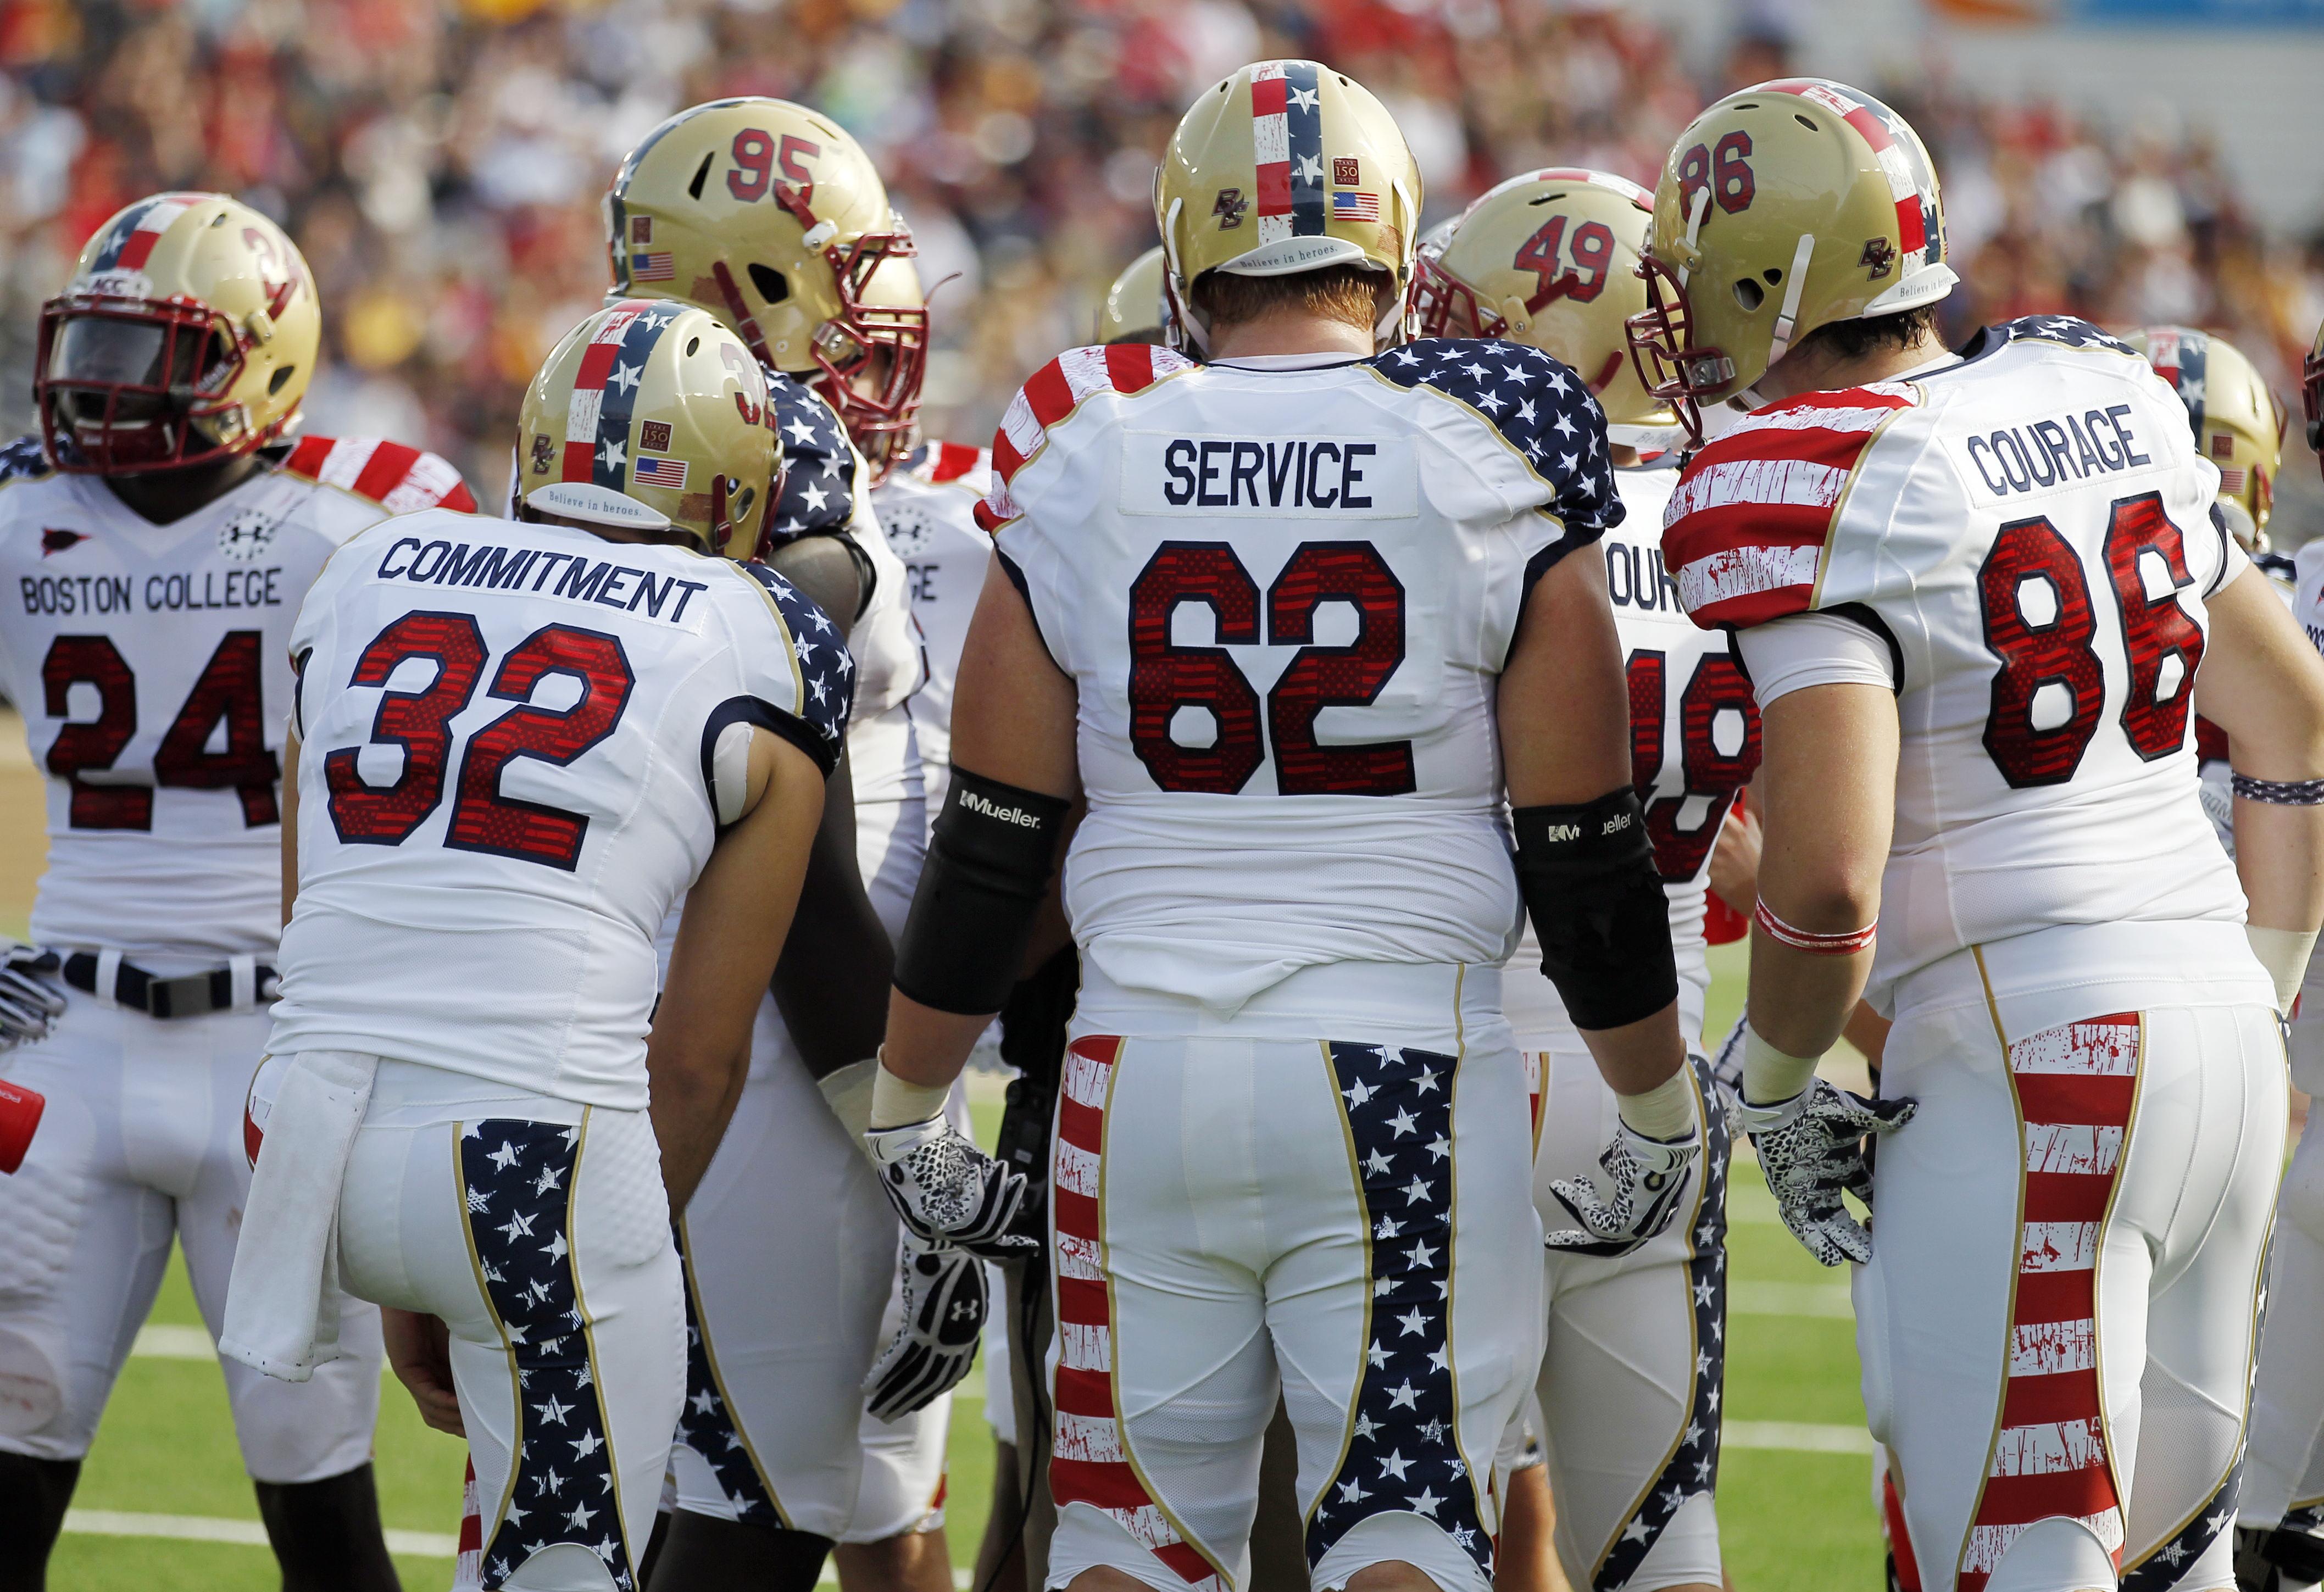 patriotic football jersey